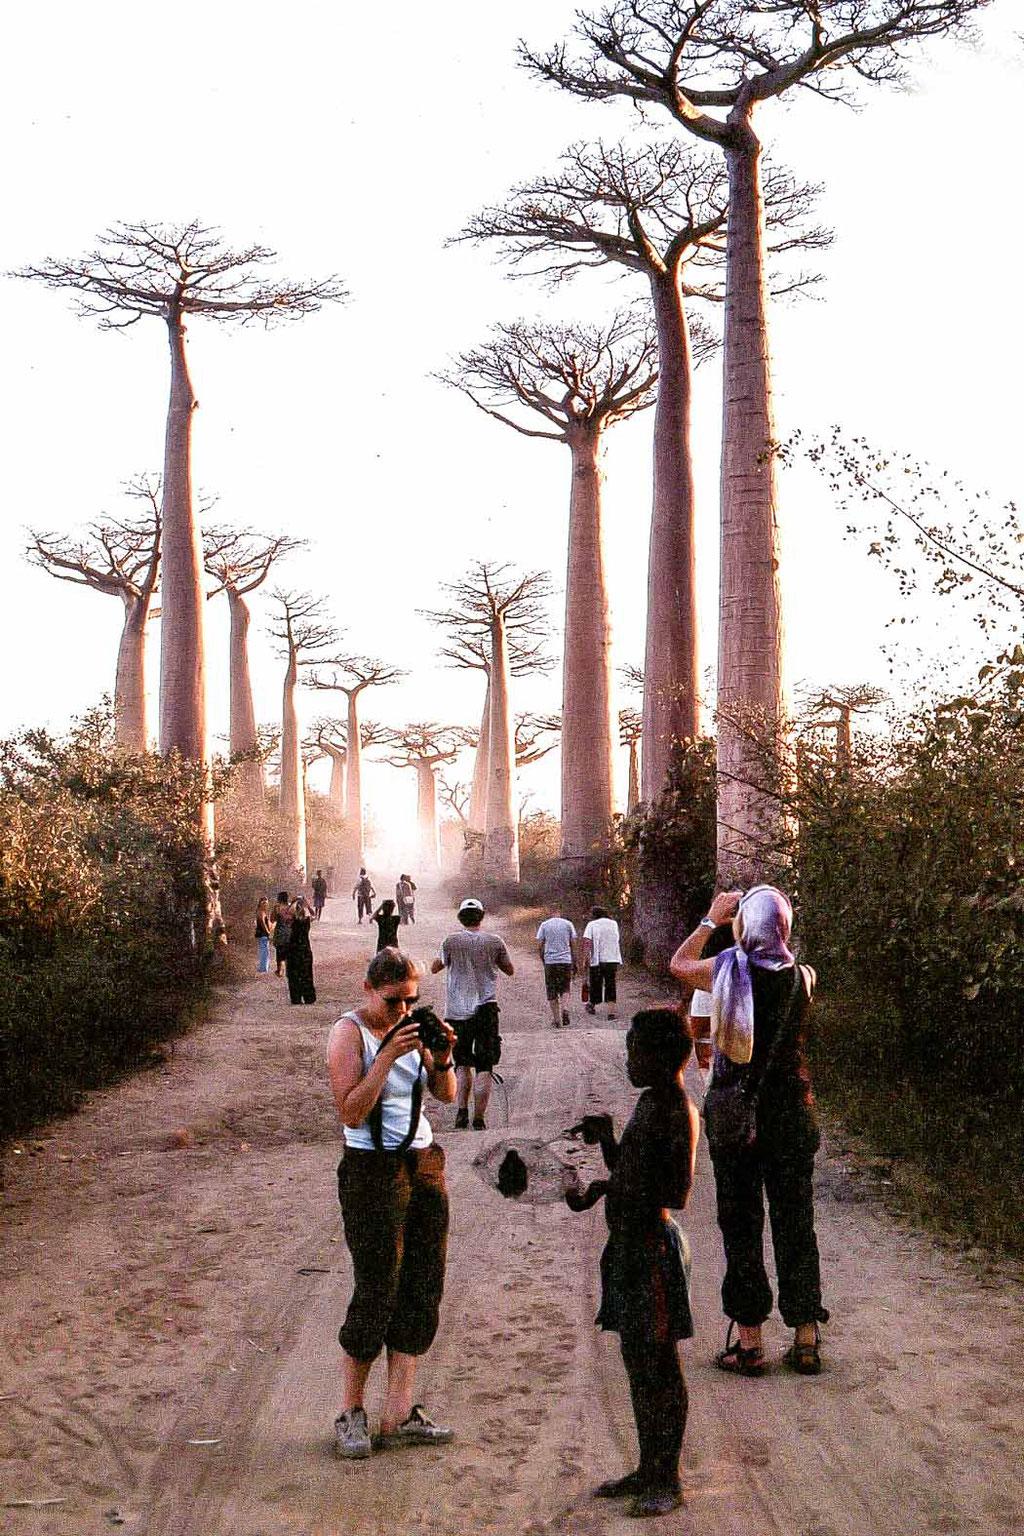 Baobap Allee/alley, bei/near Morondova, Madagaskar